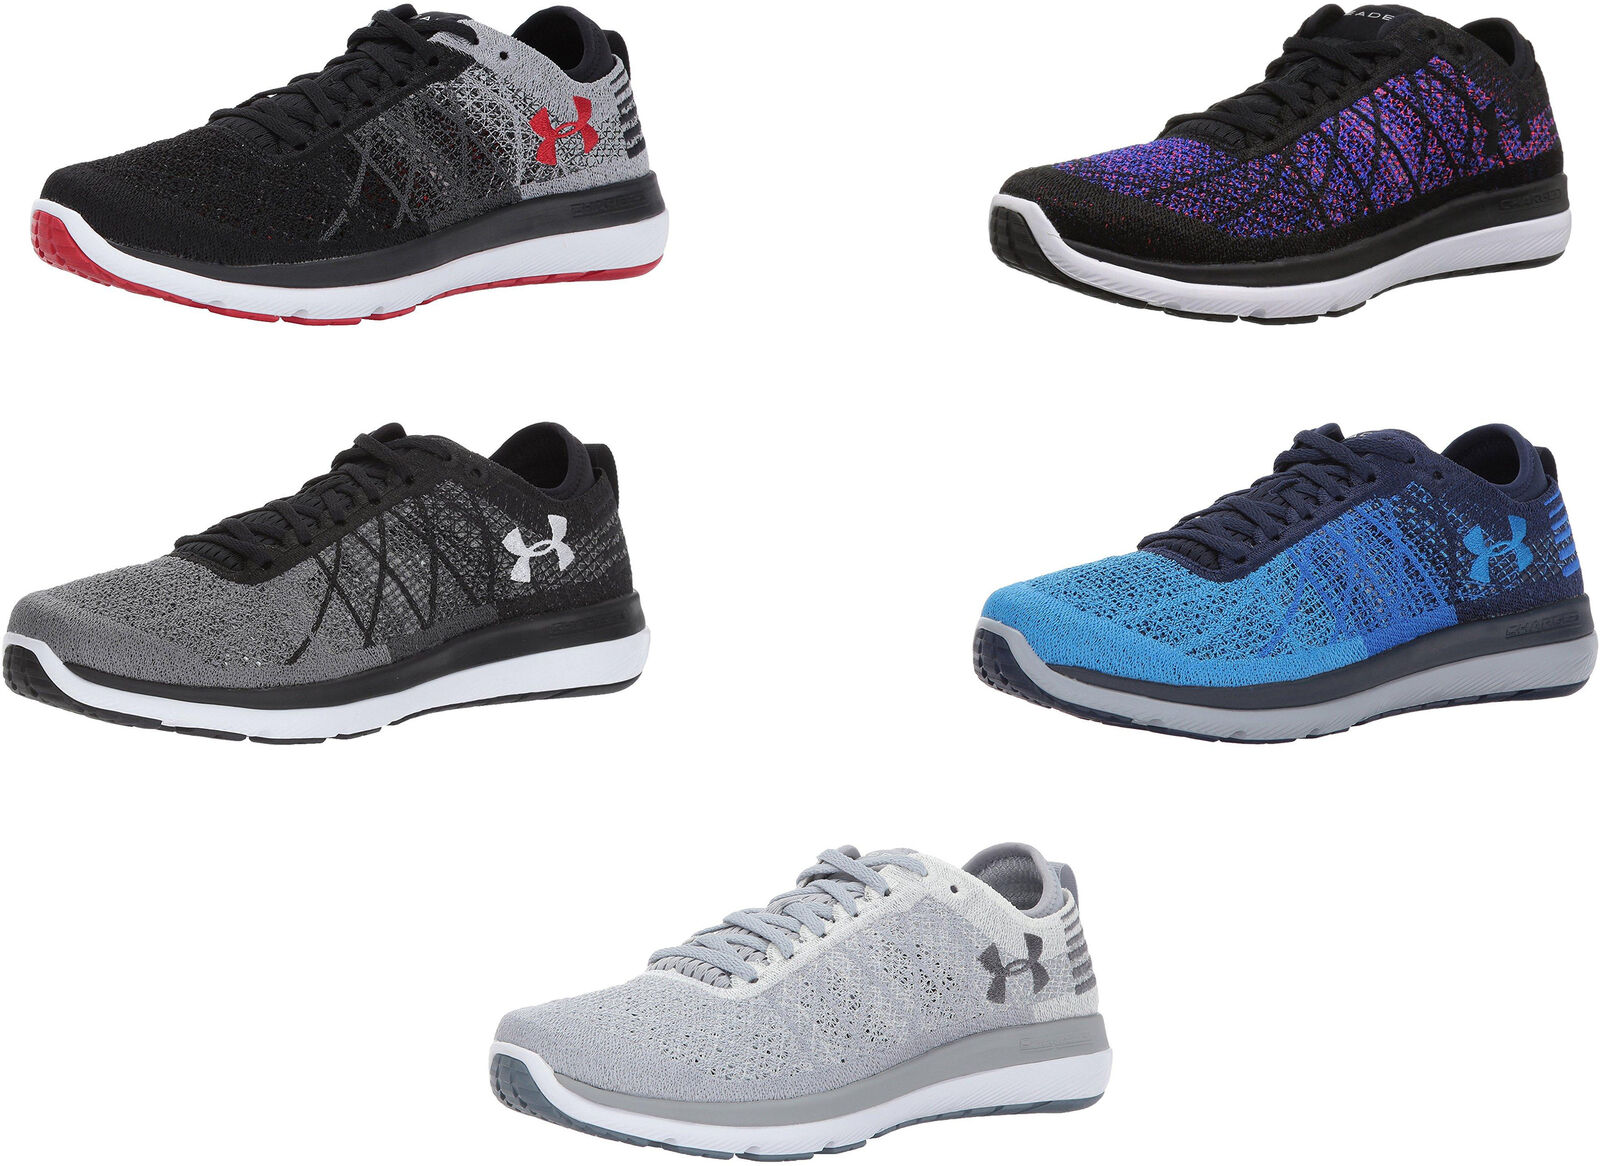 best sneakers 67615 4c1af Details about Under Armour Men's Threadborne Fortis Shoes, 5 Colors